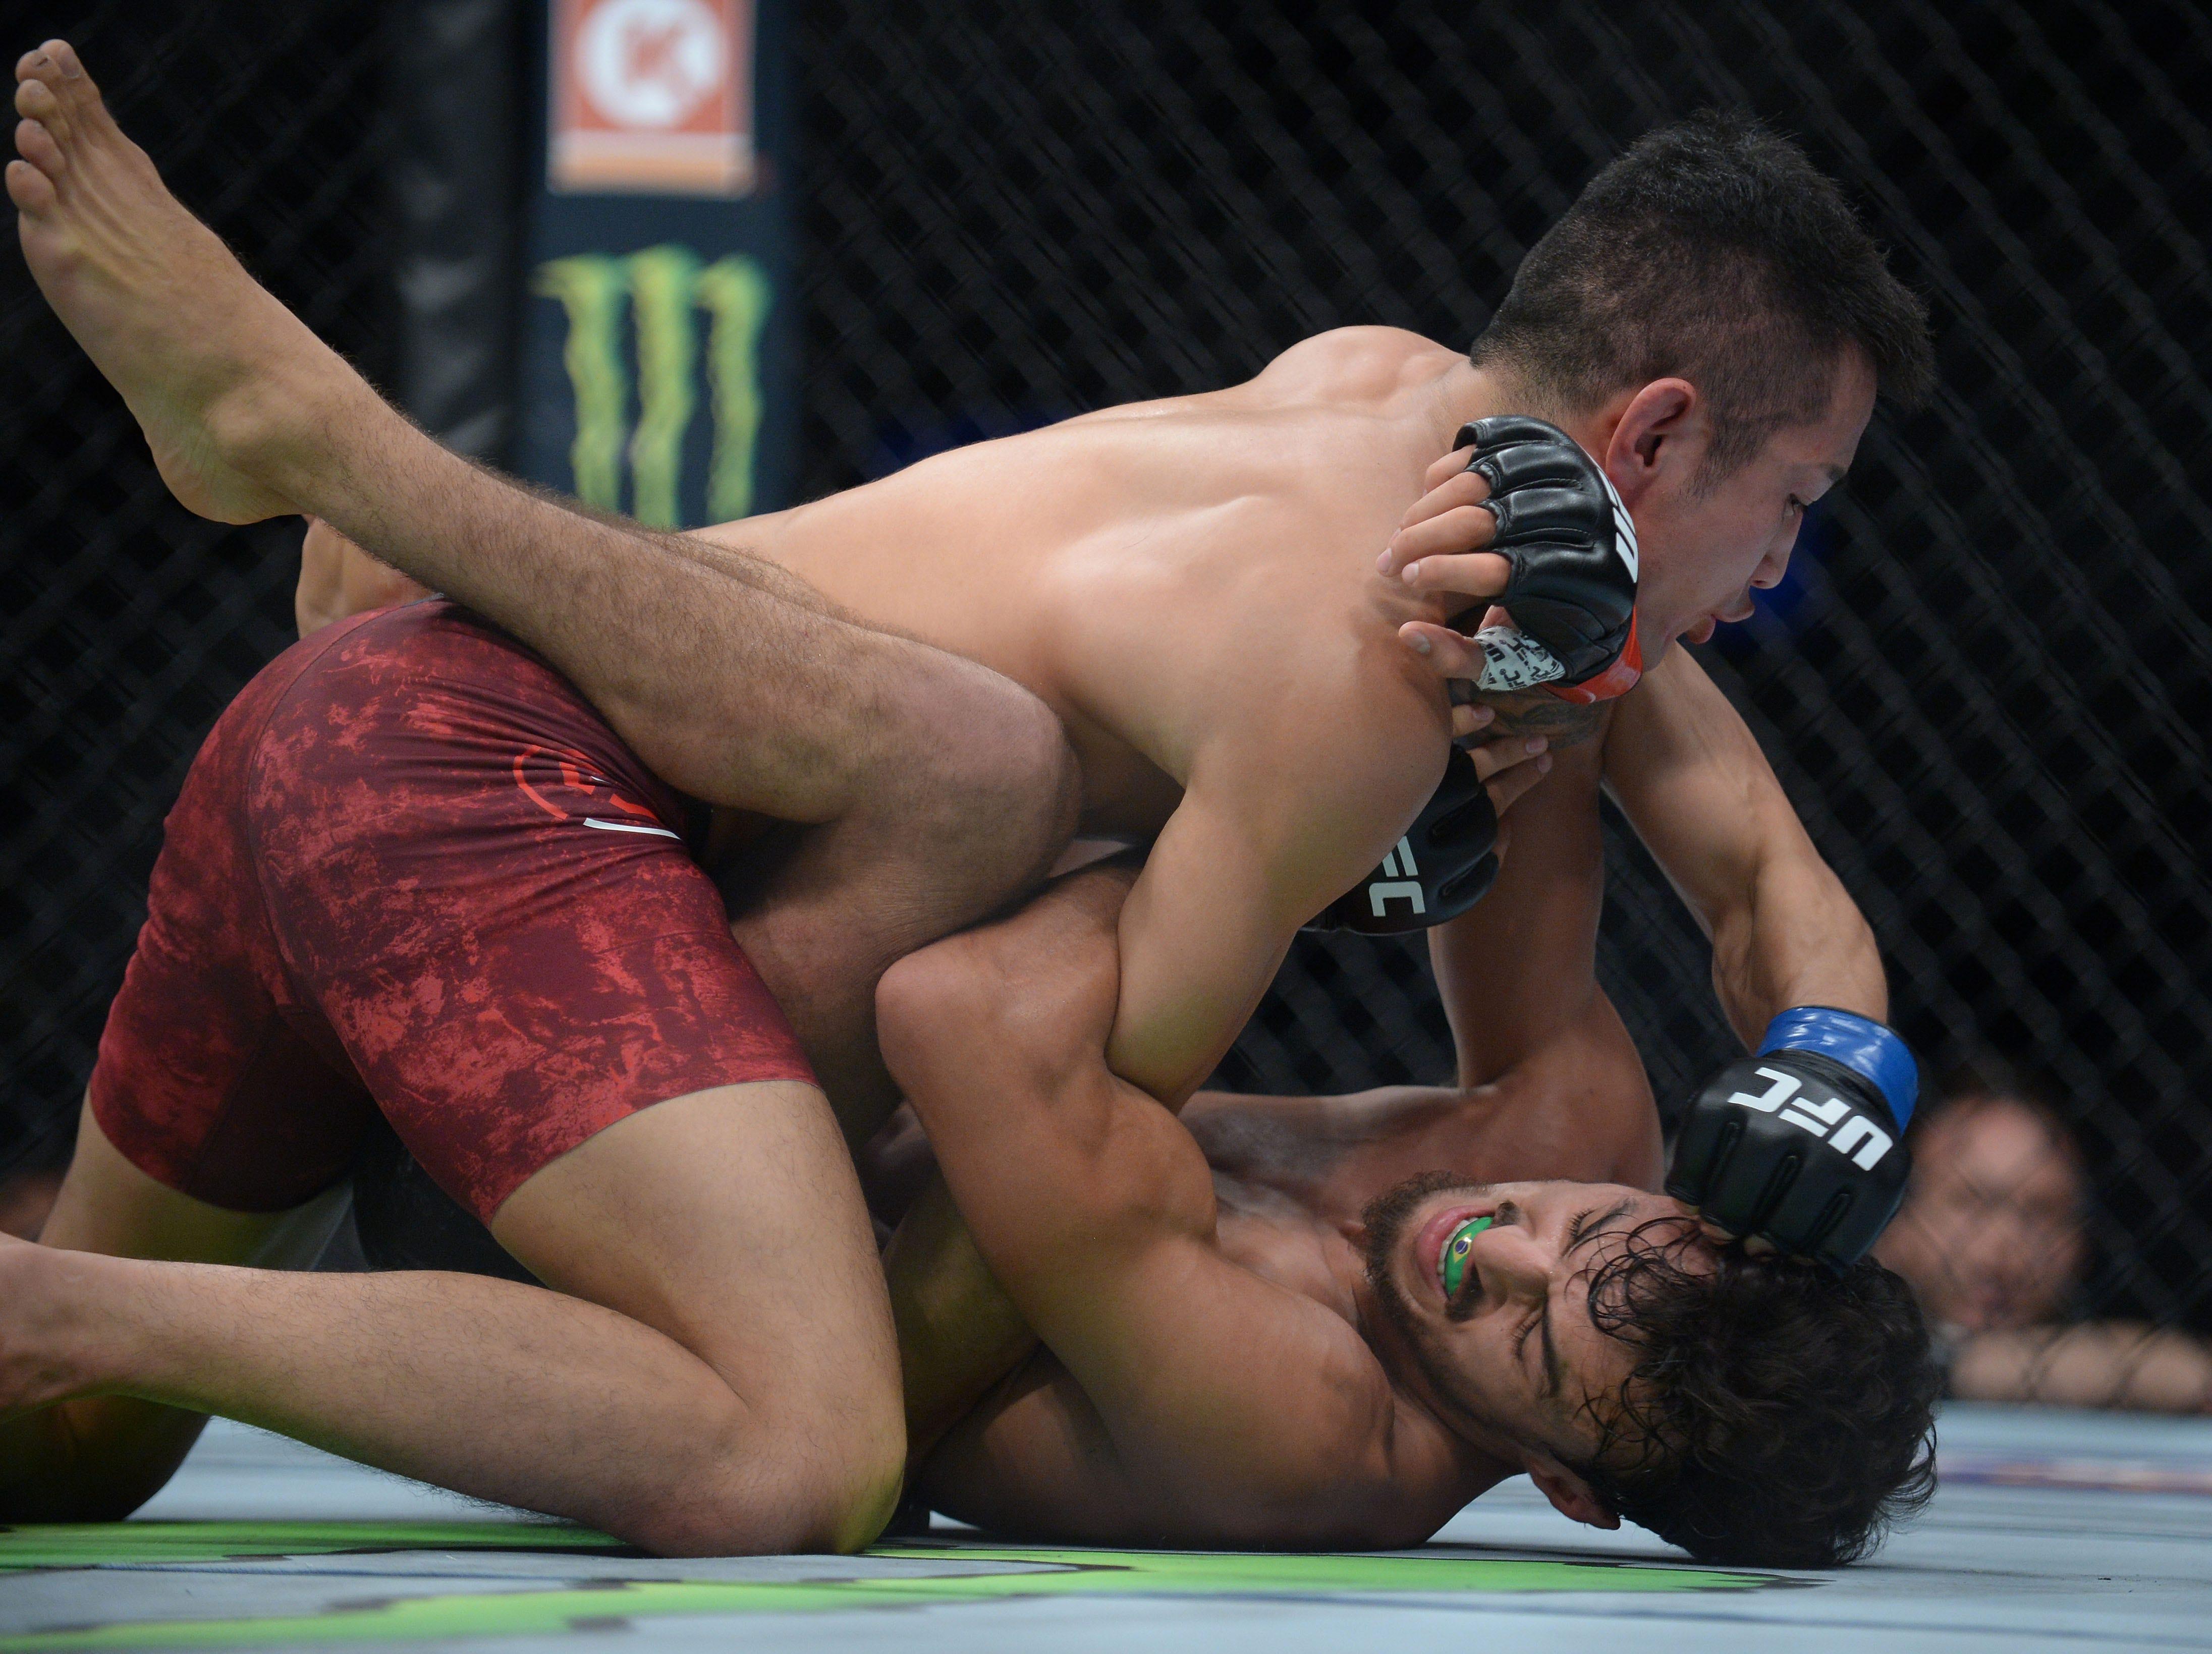 Kyung Ho Kang pins Ricardo Ramos to the mat during UFC 227 at Staples Center.